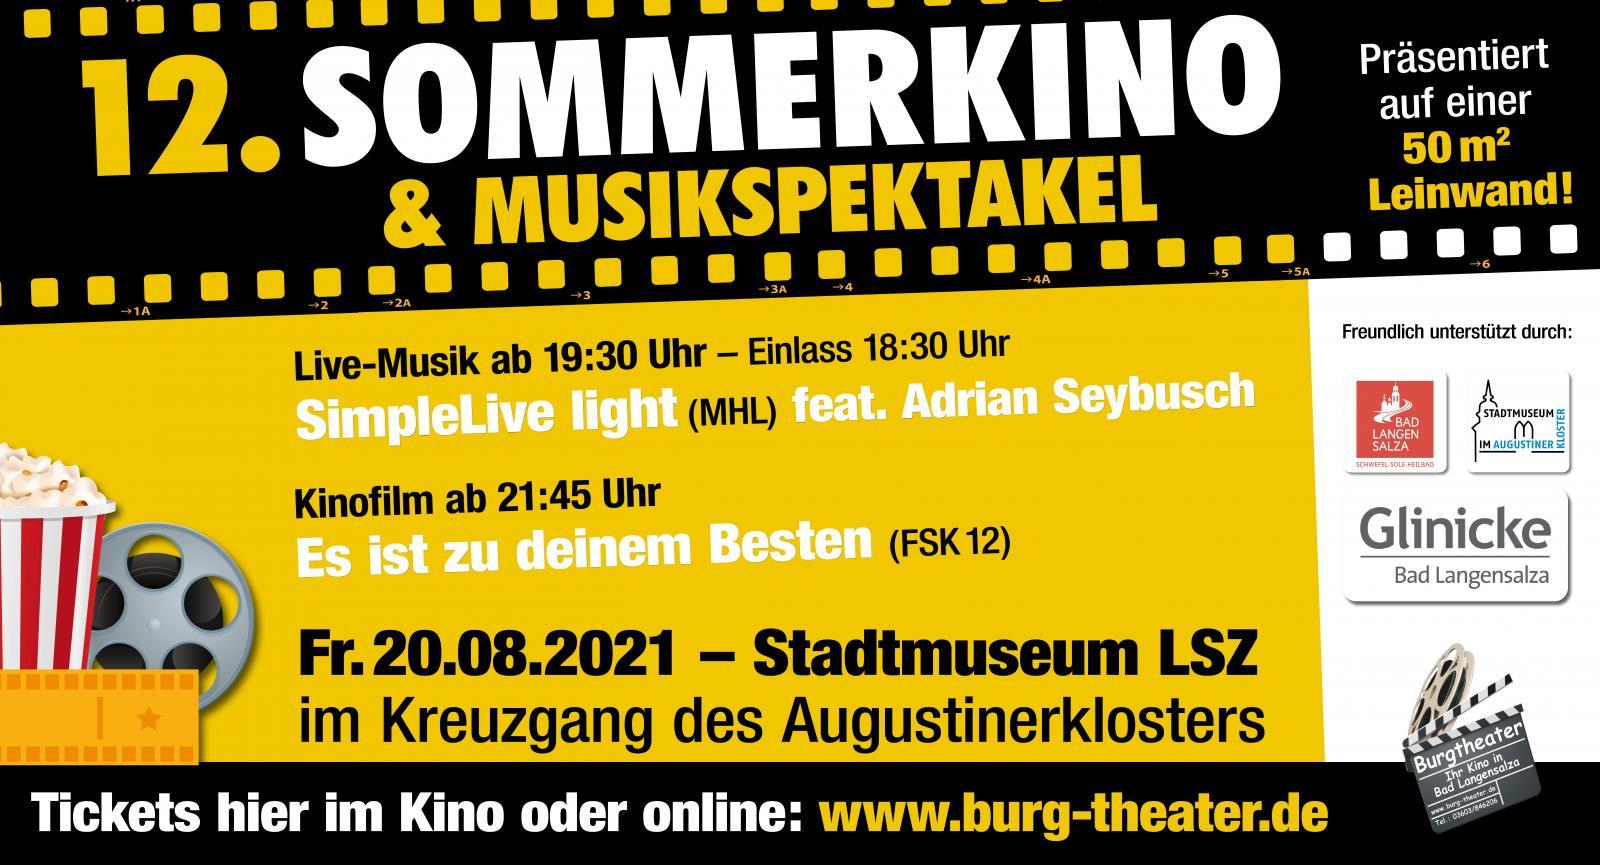 12. Sommerkino & Musikspektakel